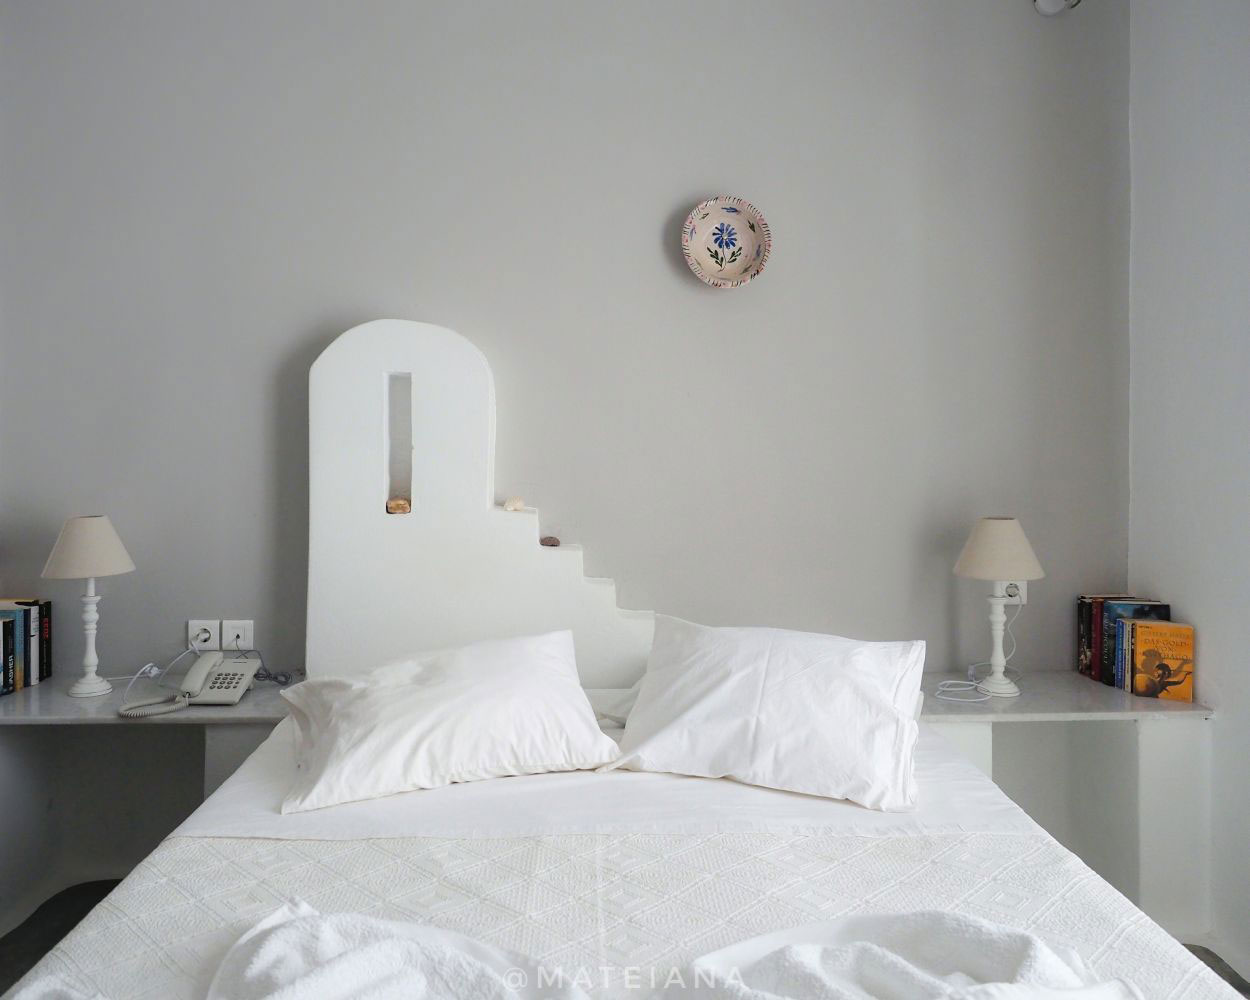 Cycladic-style bed at Bungalows Svoronos, Paros